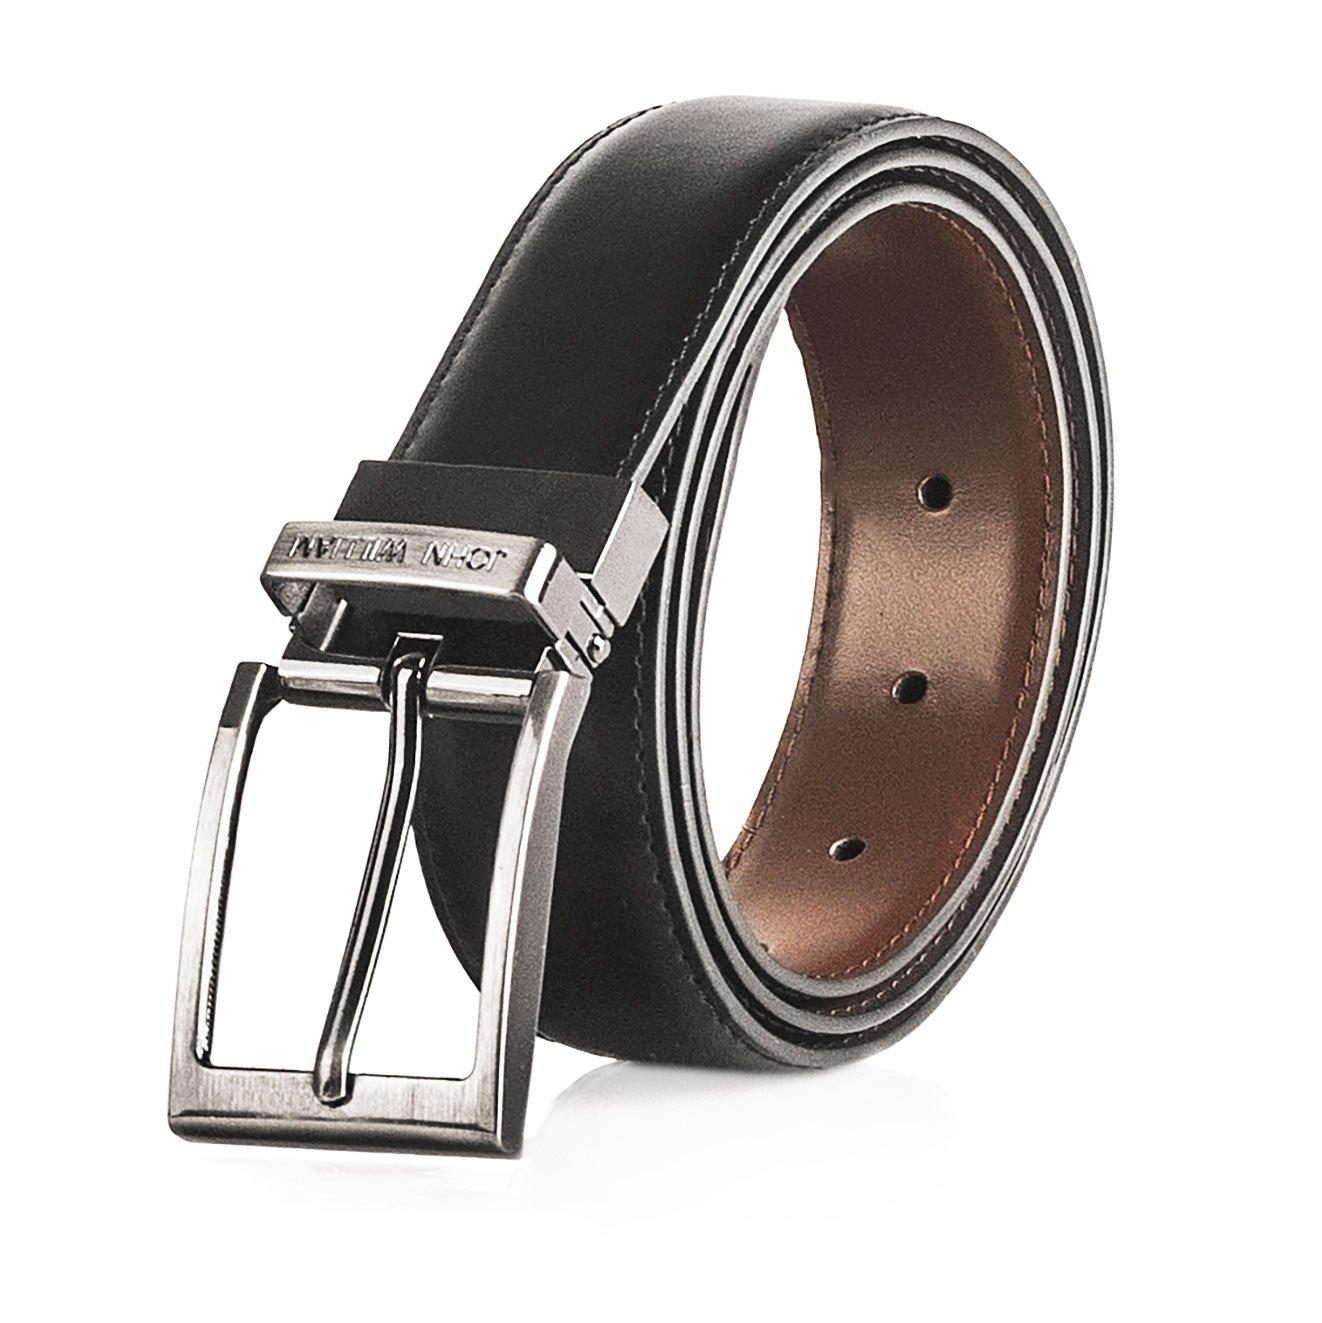 Men's Genuine Leather Swivel Reversible Black & Brown Dress Belt: Mens belts for Business or Formal Wear - 42